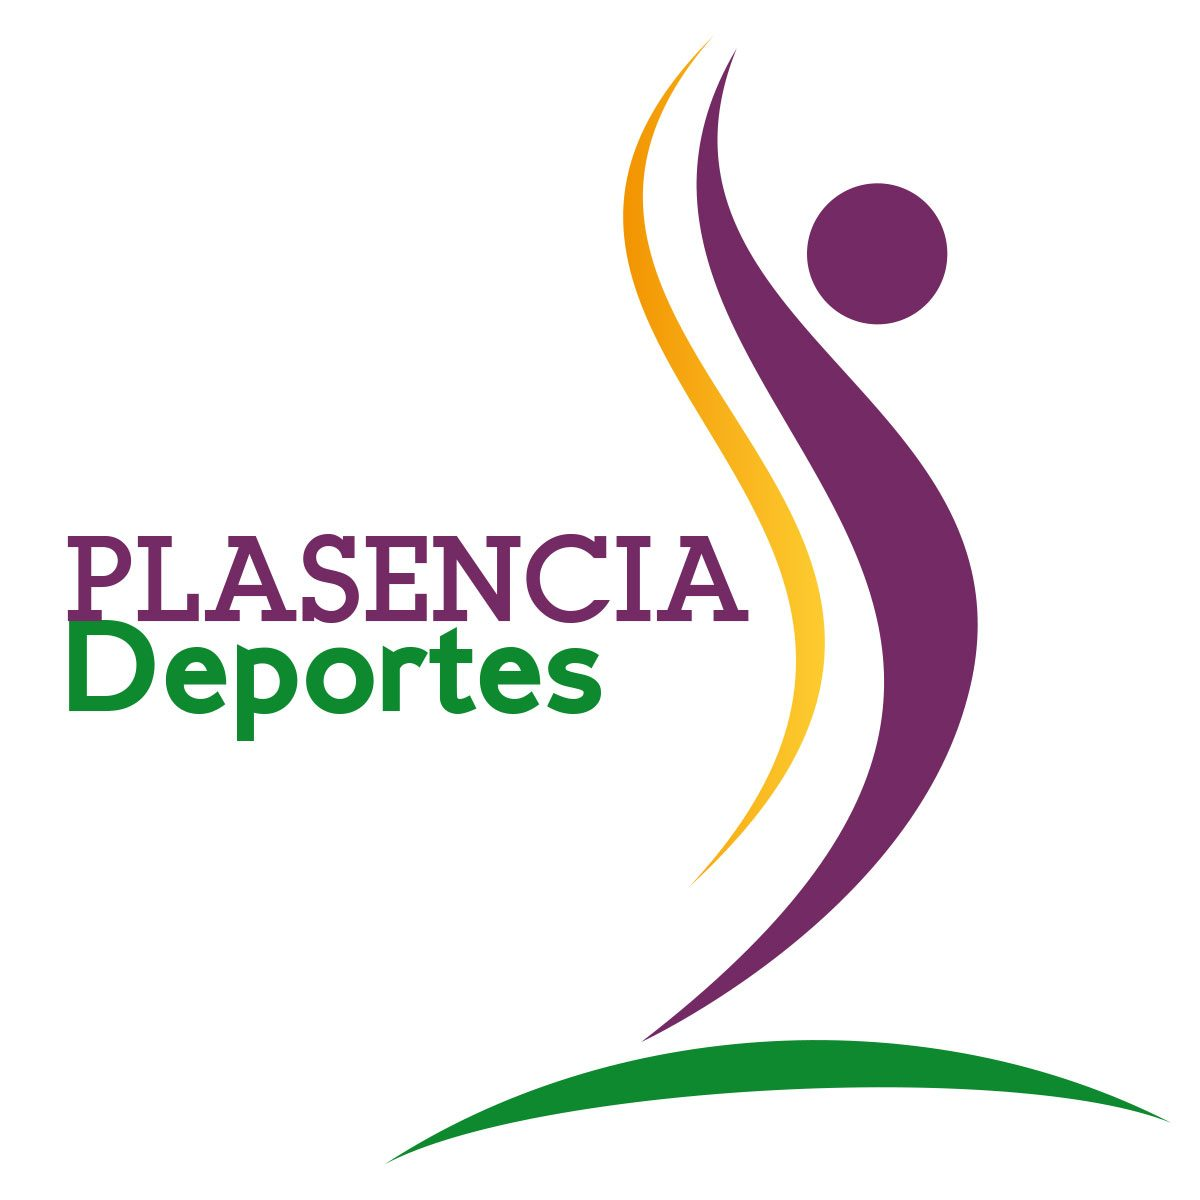 cropped-Plasencia_deportes.jpg